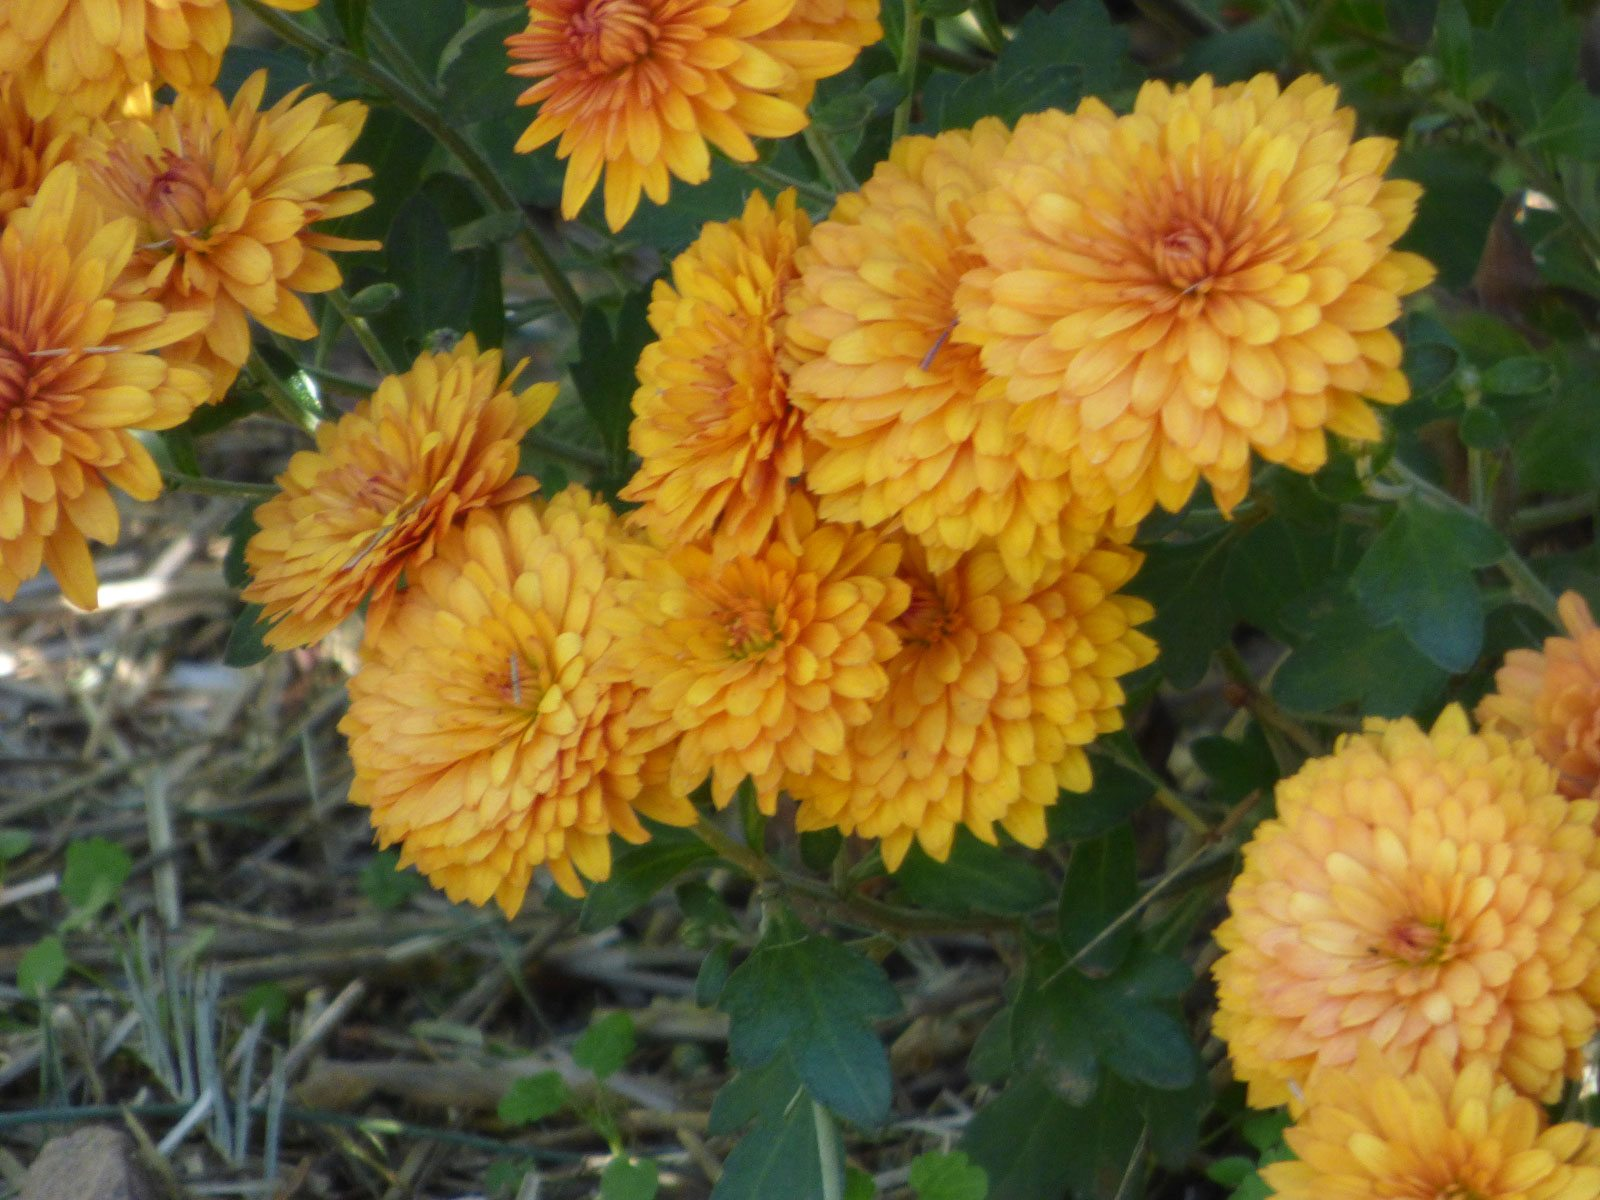 Lifespan Of Mums How Long Do Chrysanthemums Last